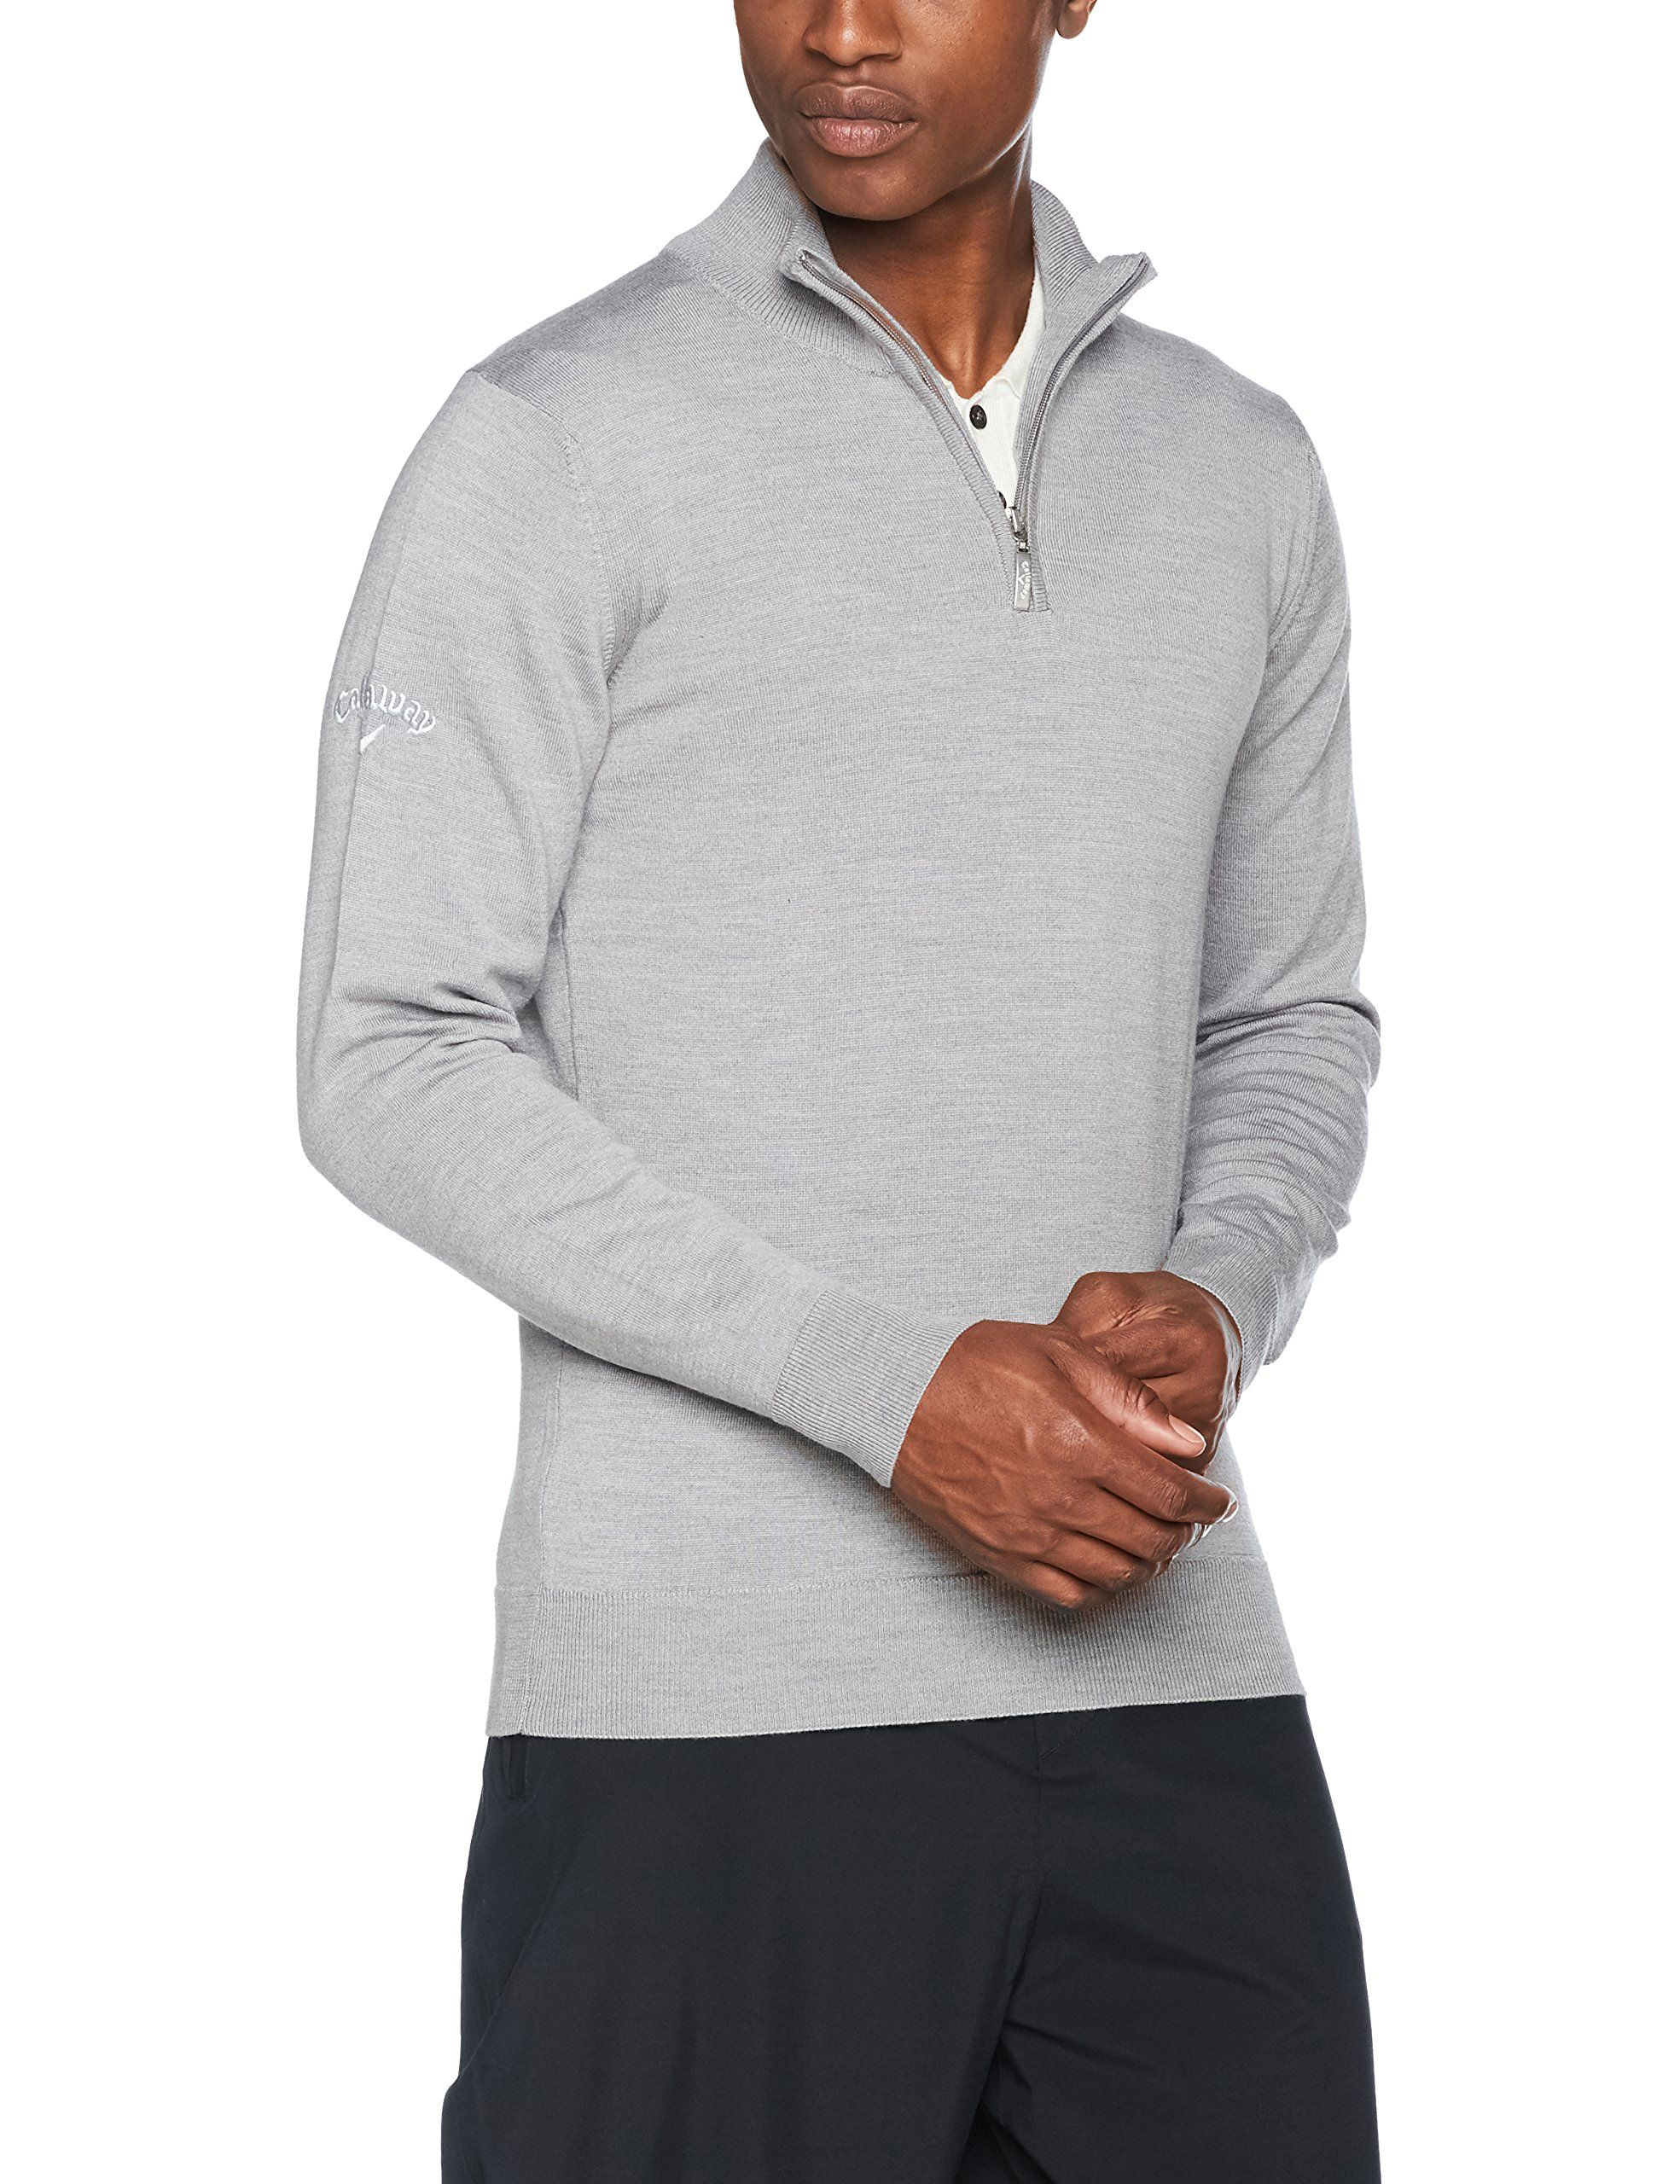 Callaway Golf Mens Merino 14 Zip Sweater Light Grey L Sports